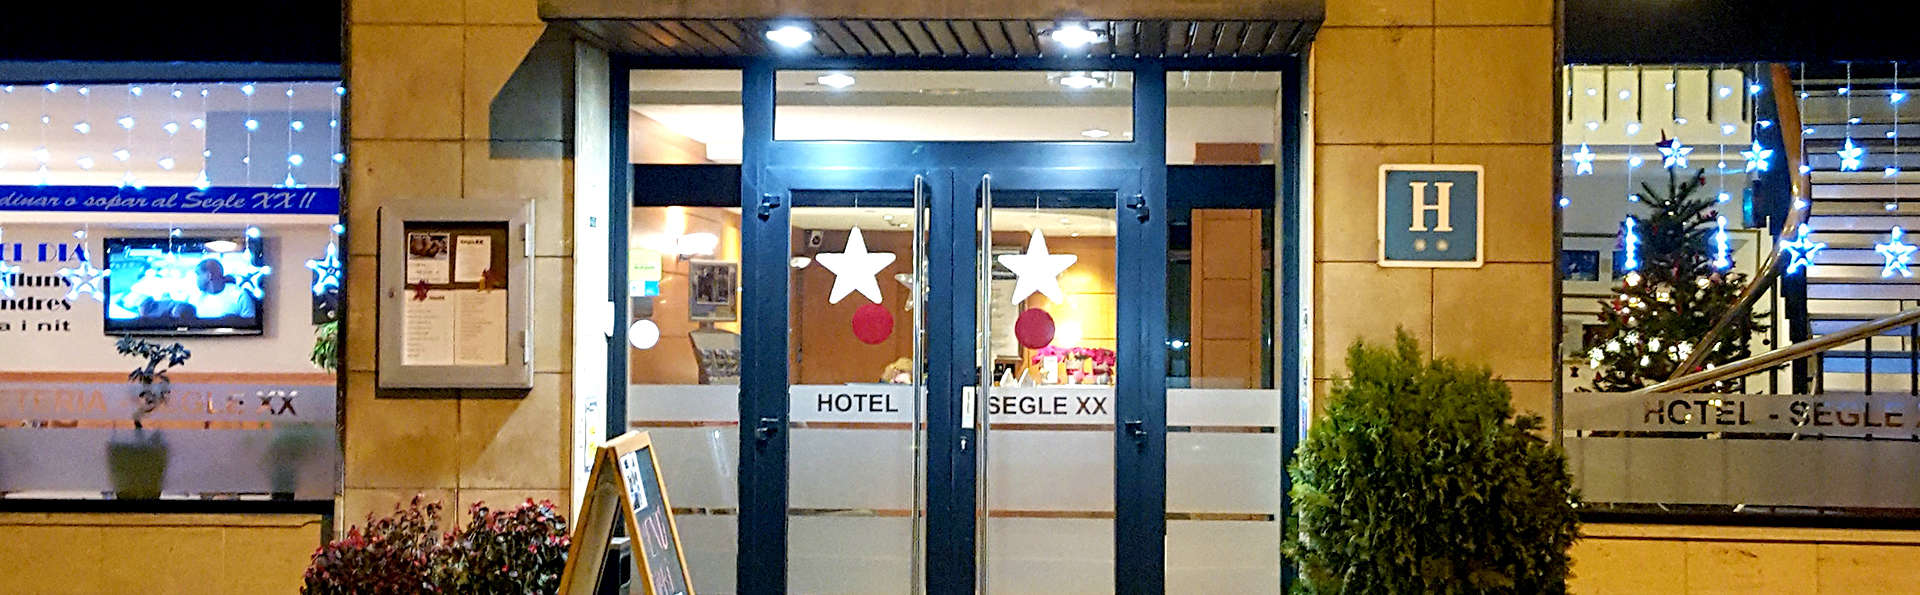 Hotel Segle XX - Edit_Front.jpg